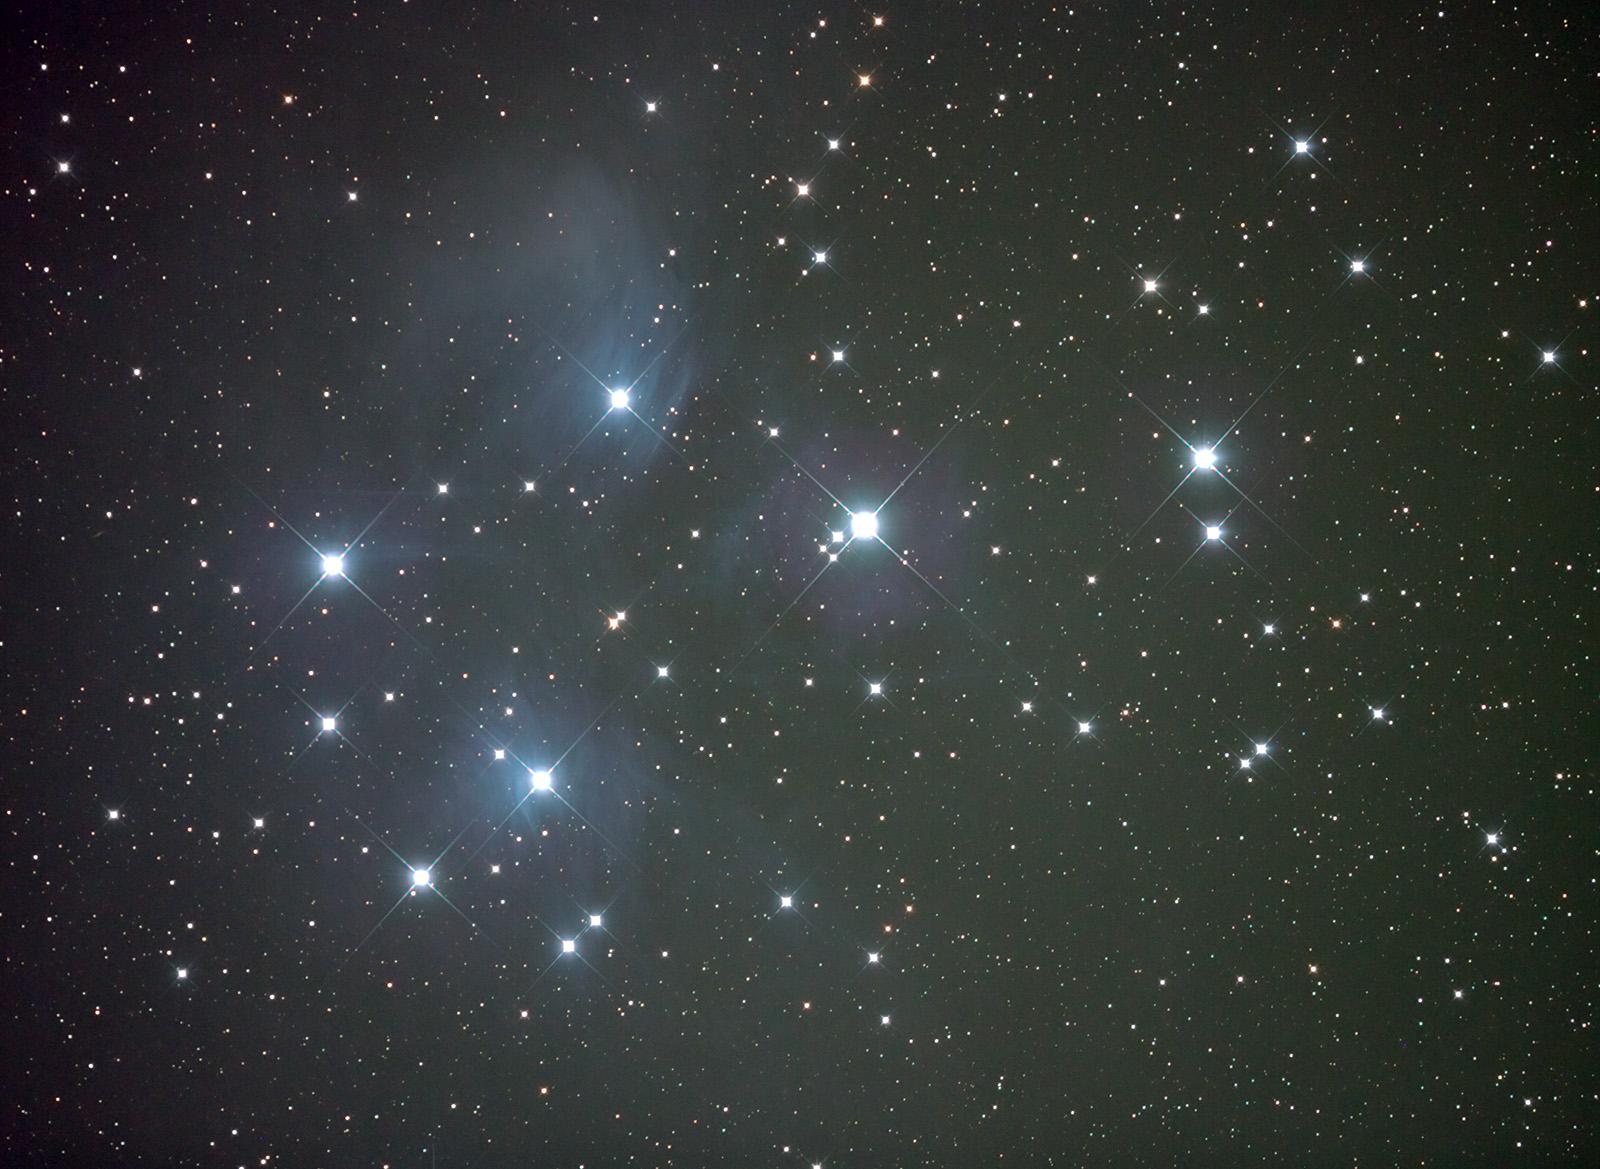 11月8日の天体写真_e0174091_1401295.jpg